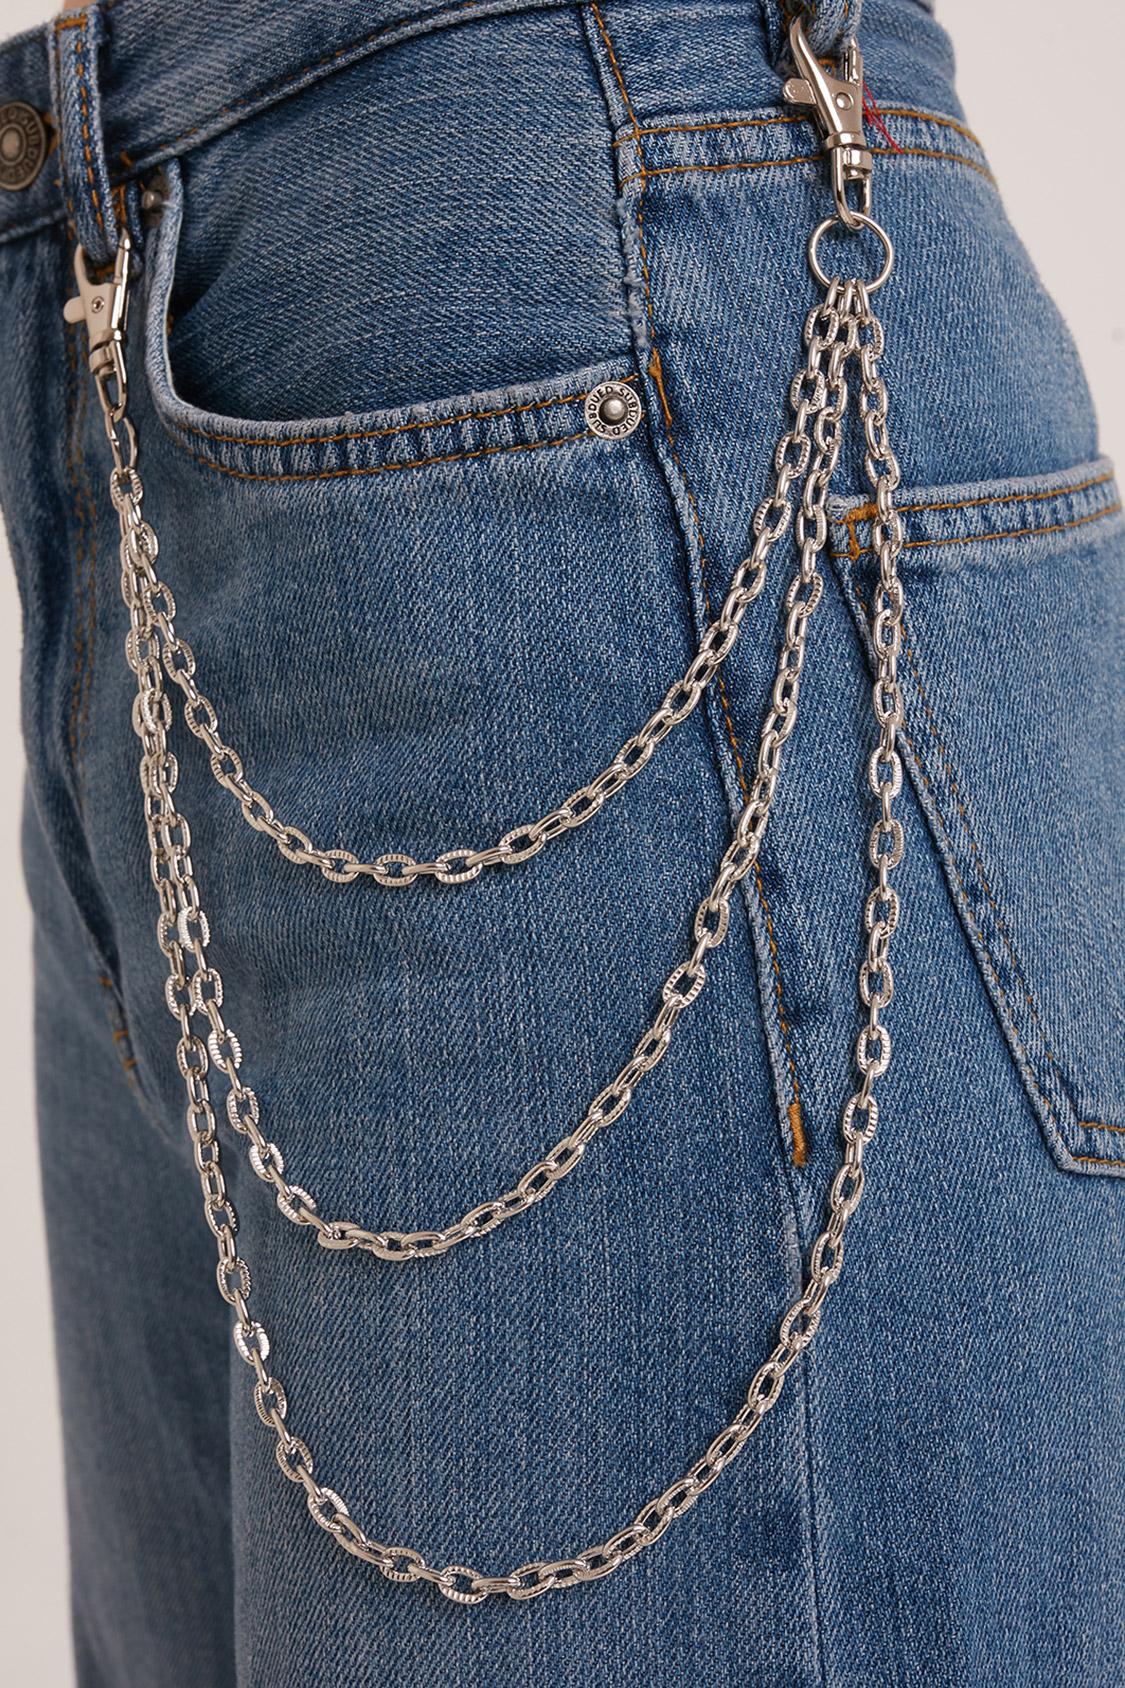 Chains belt